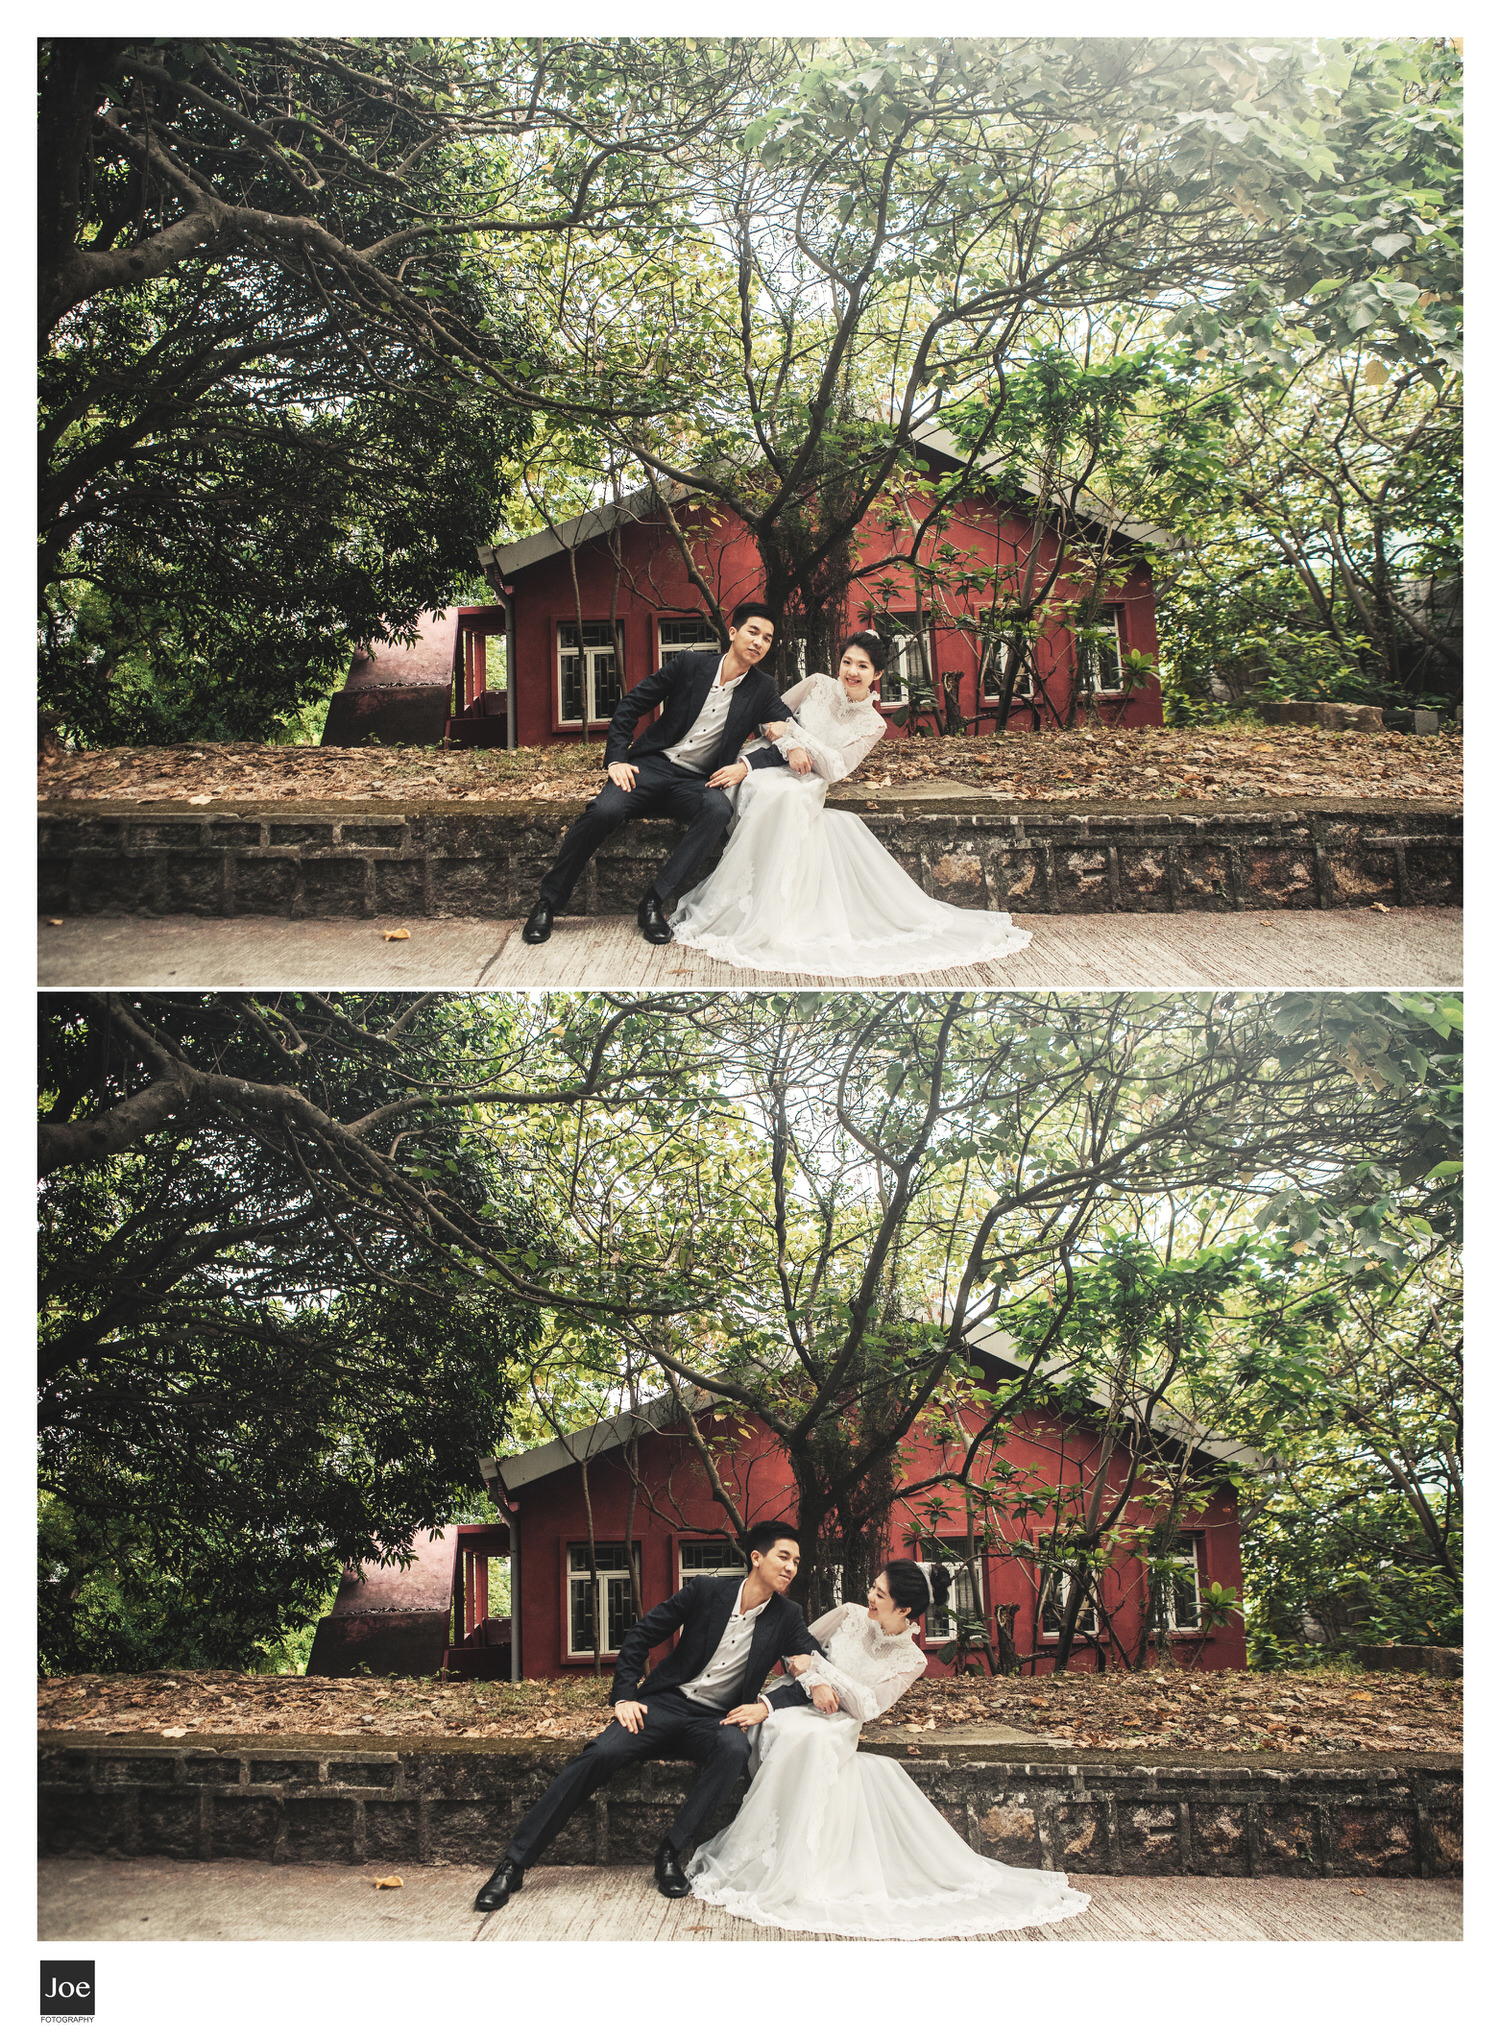 joe-fotography-macau-pre-wedding-vanessa-ho-32.jpg